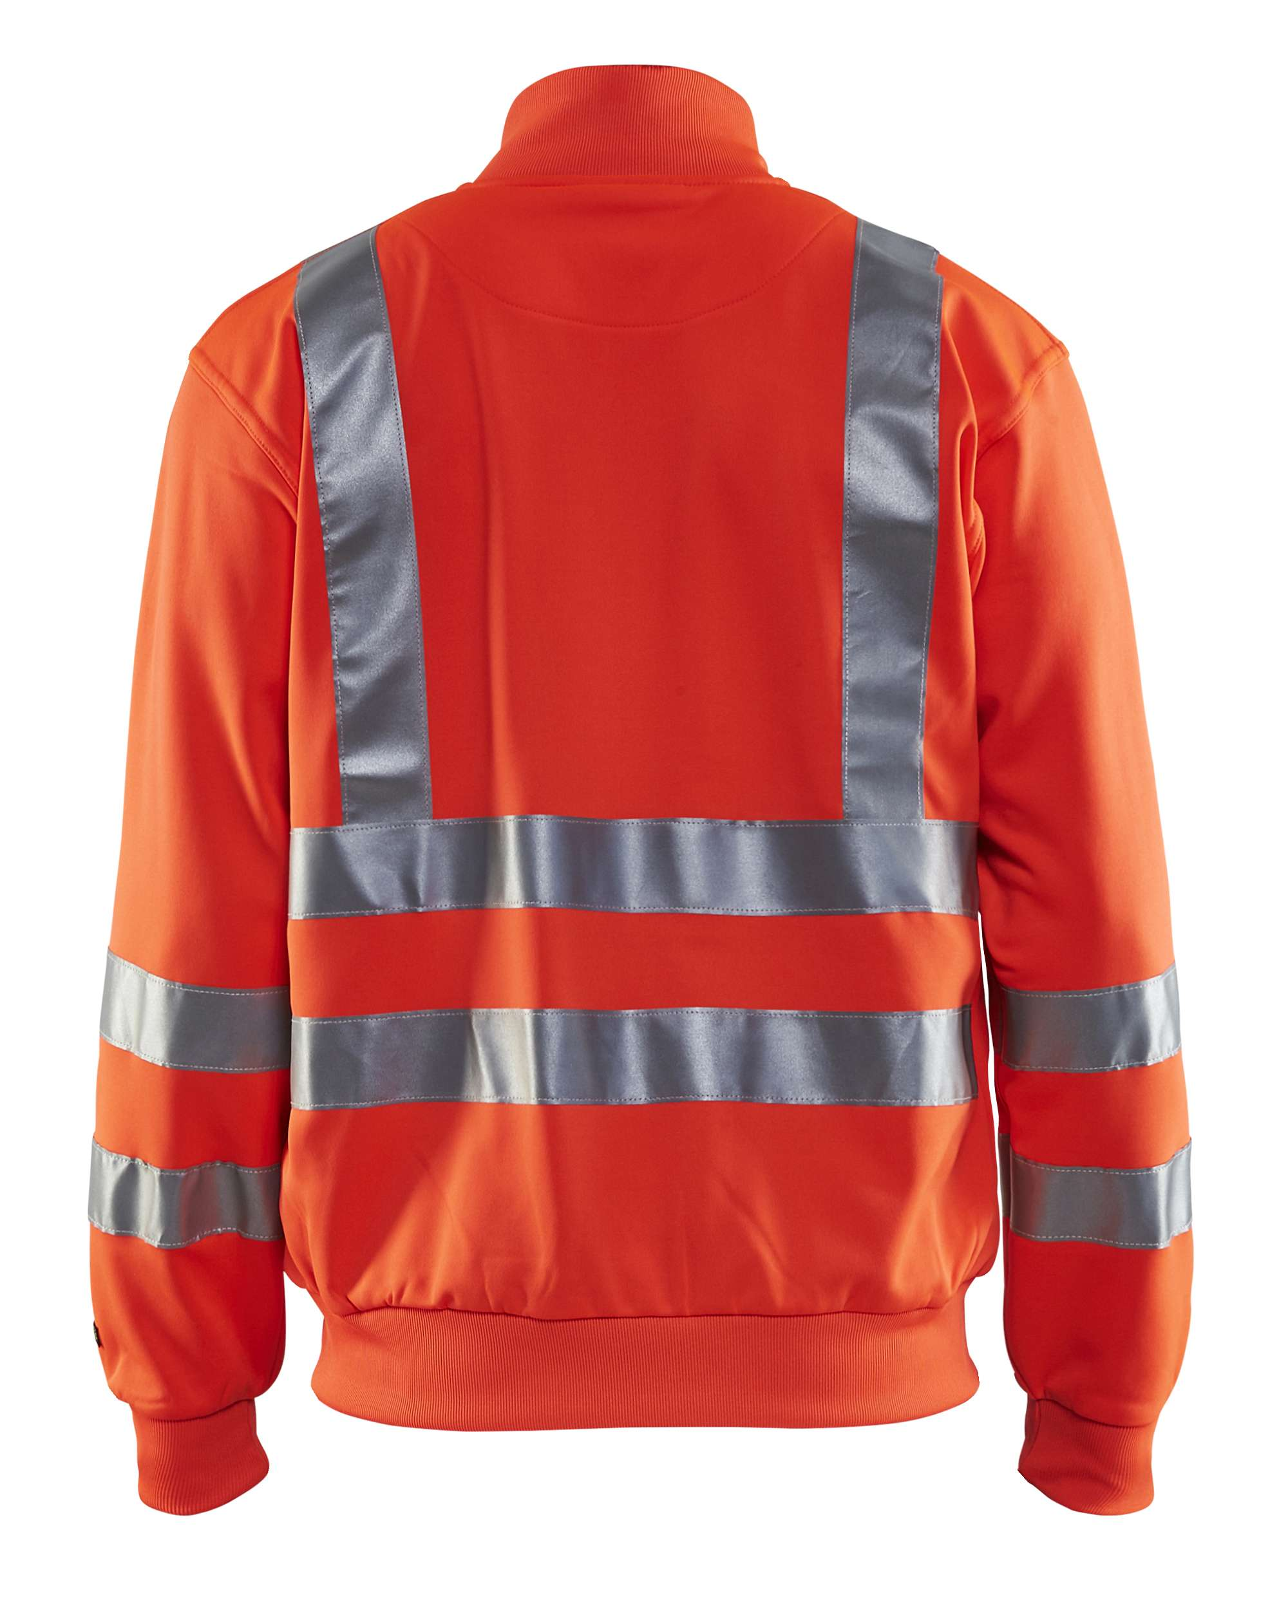 Blaklader Vesten 33581974 High Vis fluo-rood(5500)